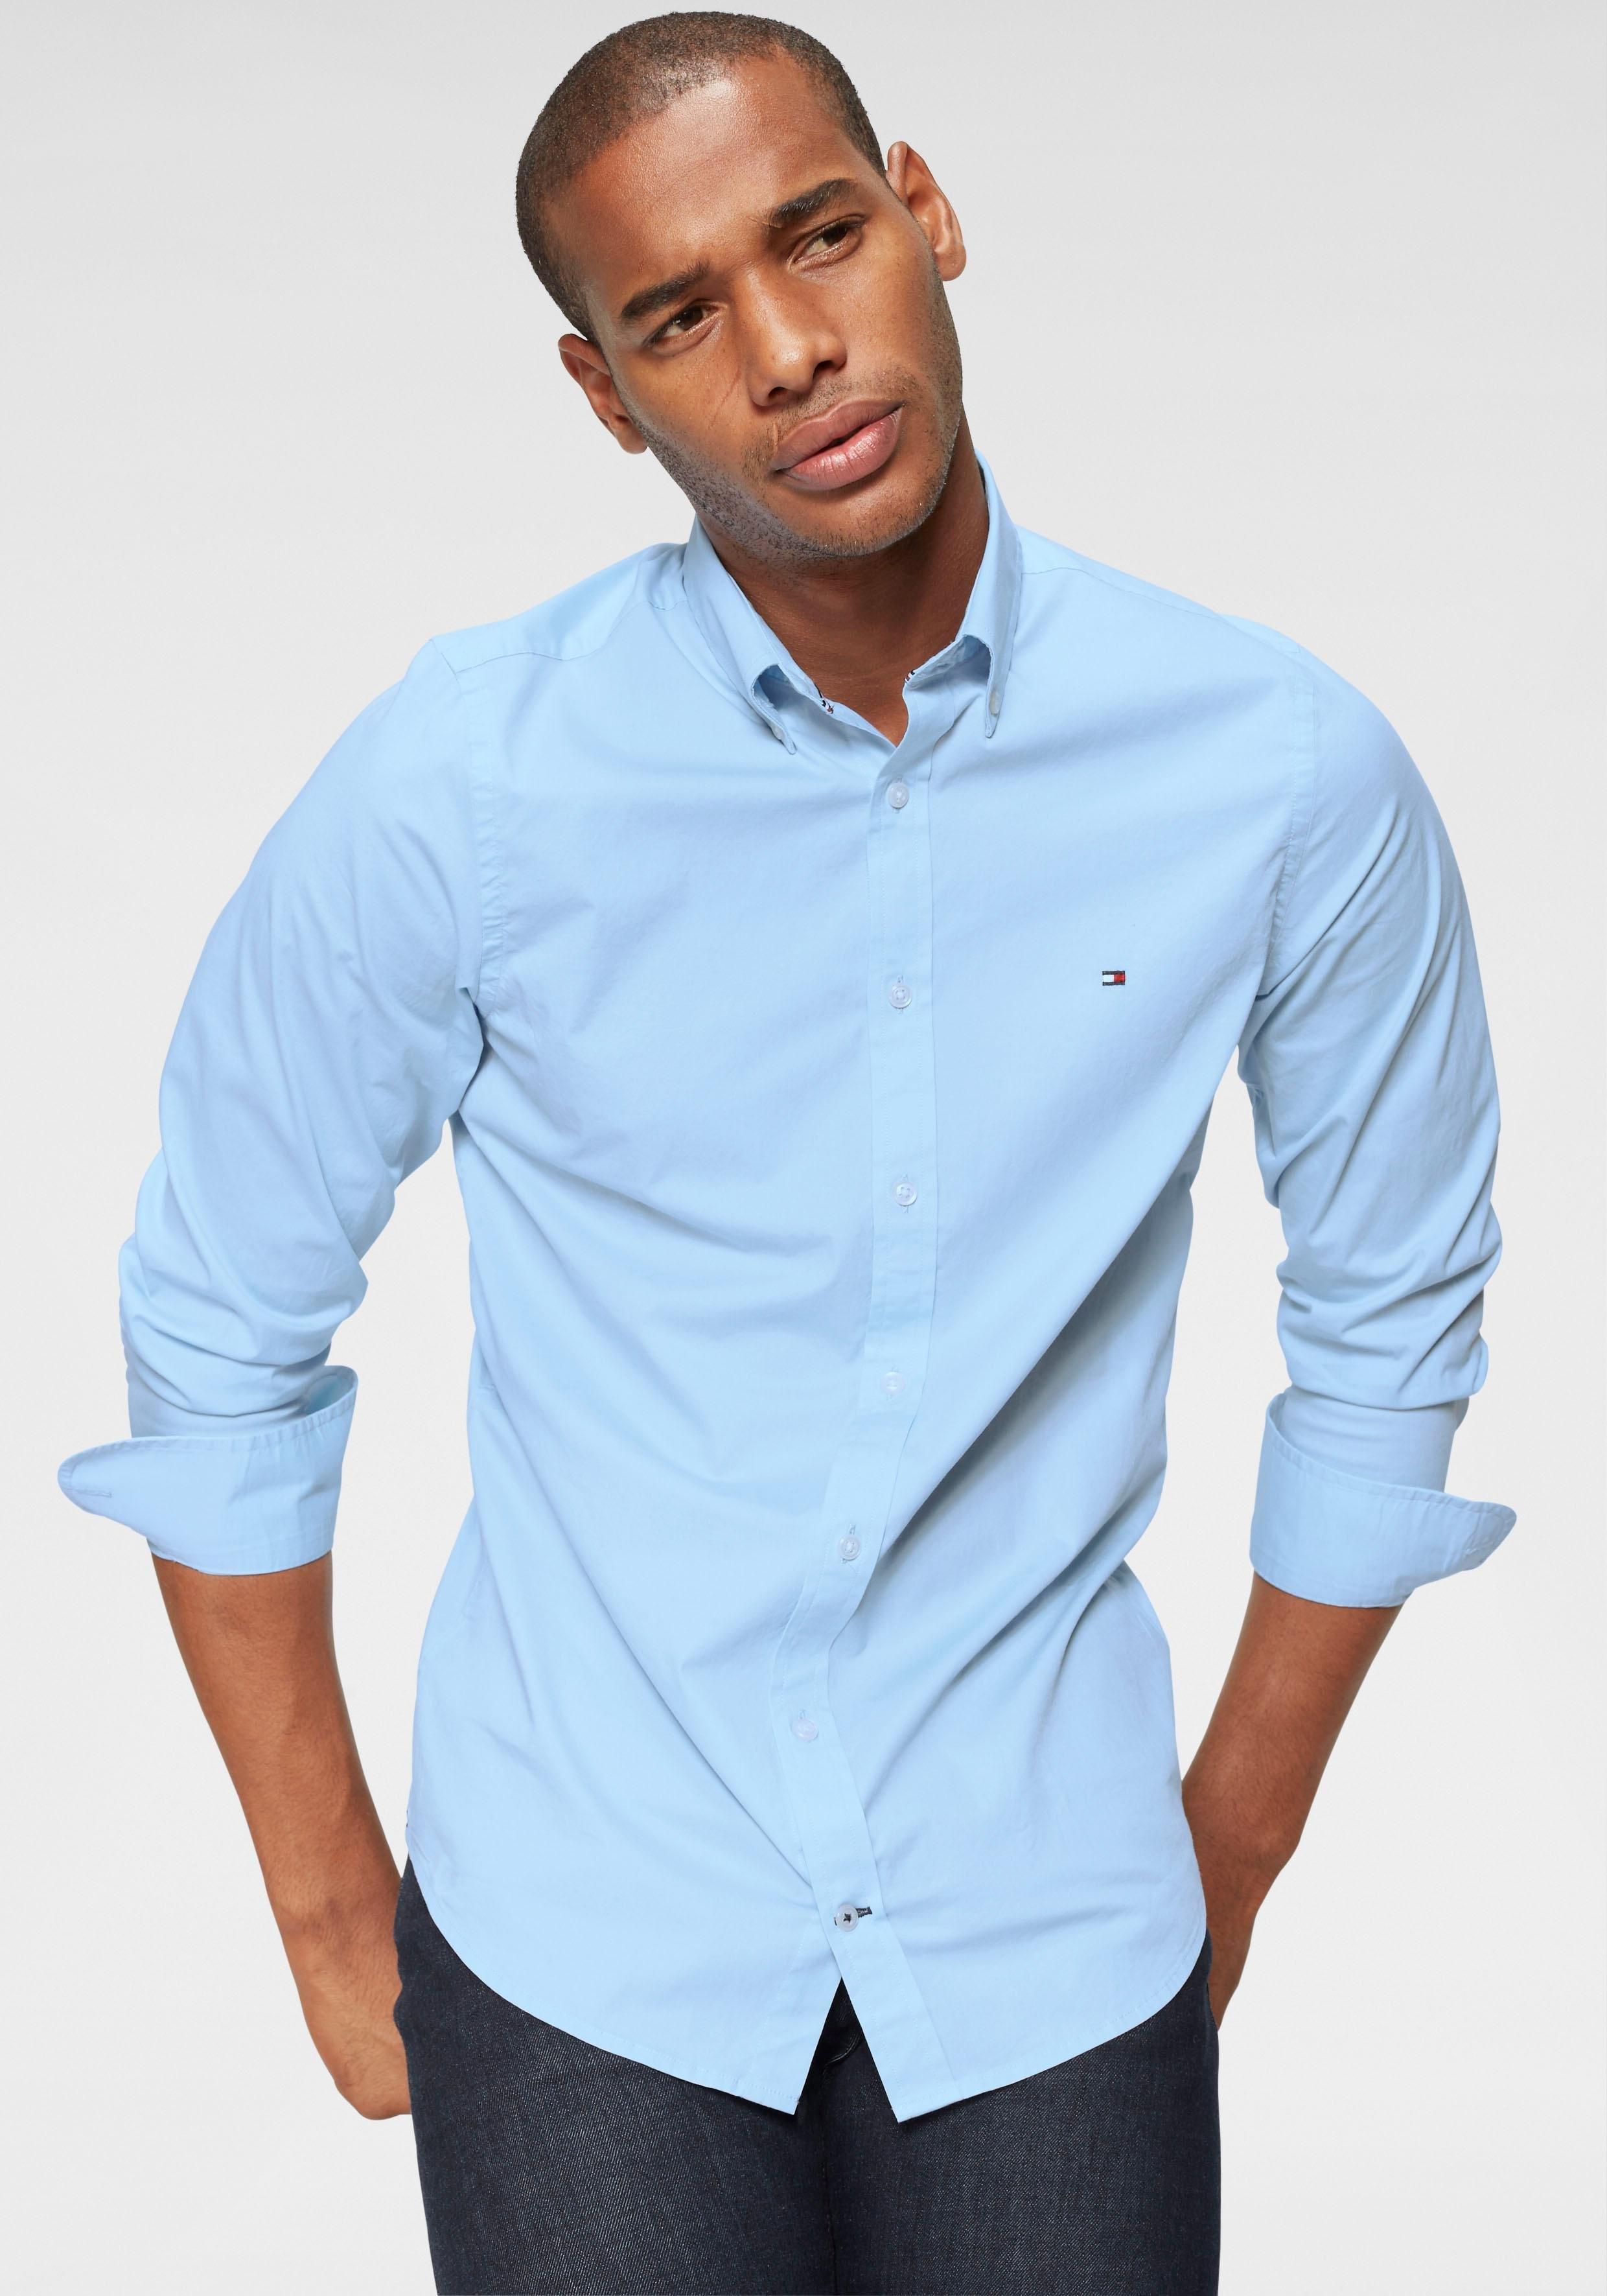 Tommy Hilfiger overhemd met lange mouwen CORE STRETCH SLIM FIT POPLIN SHIRT bij OTTO online kopen